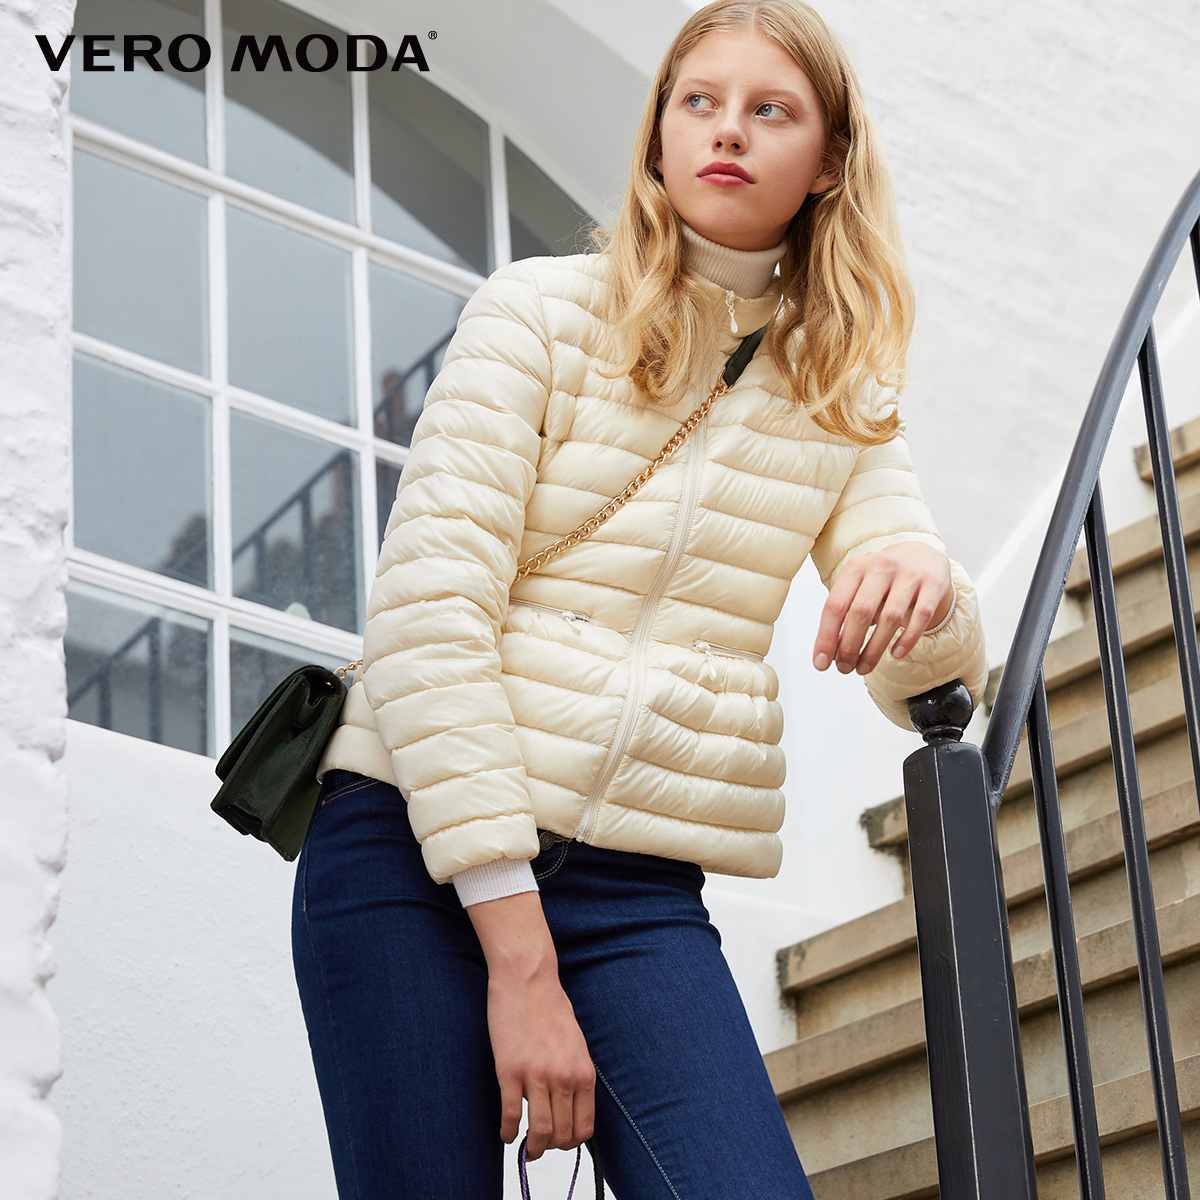 Vero Moda New Waist Short Foldable Portable Short Down Jacket Women | 318423527